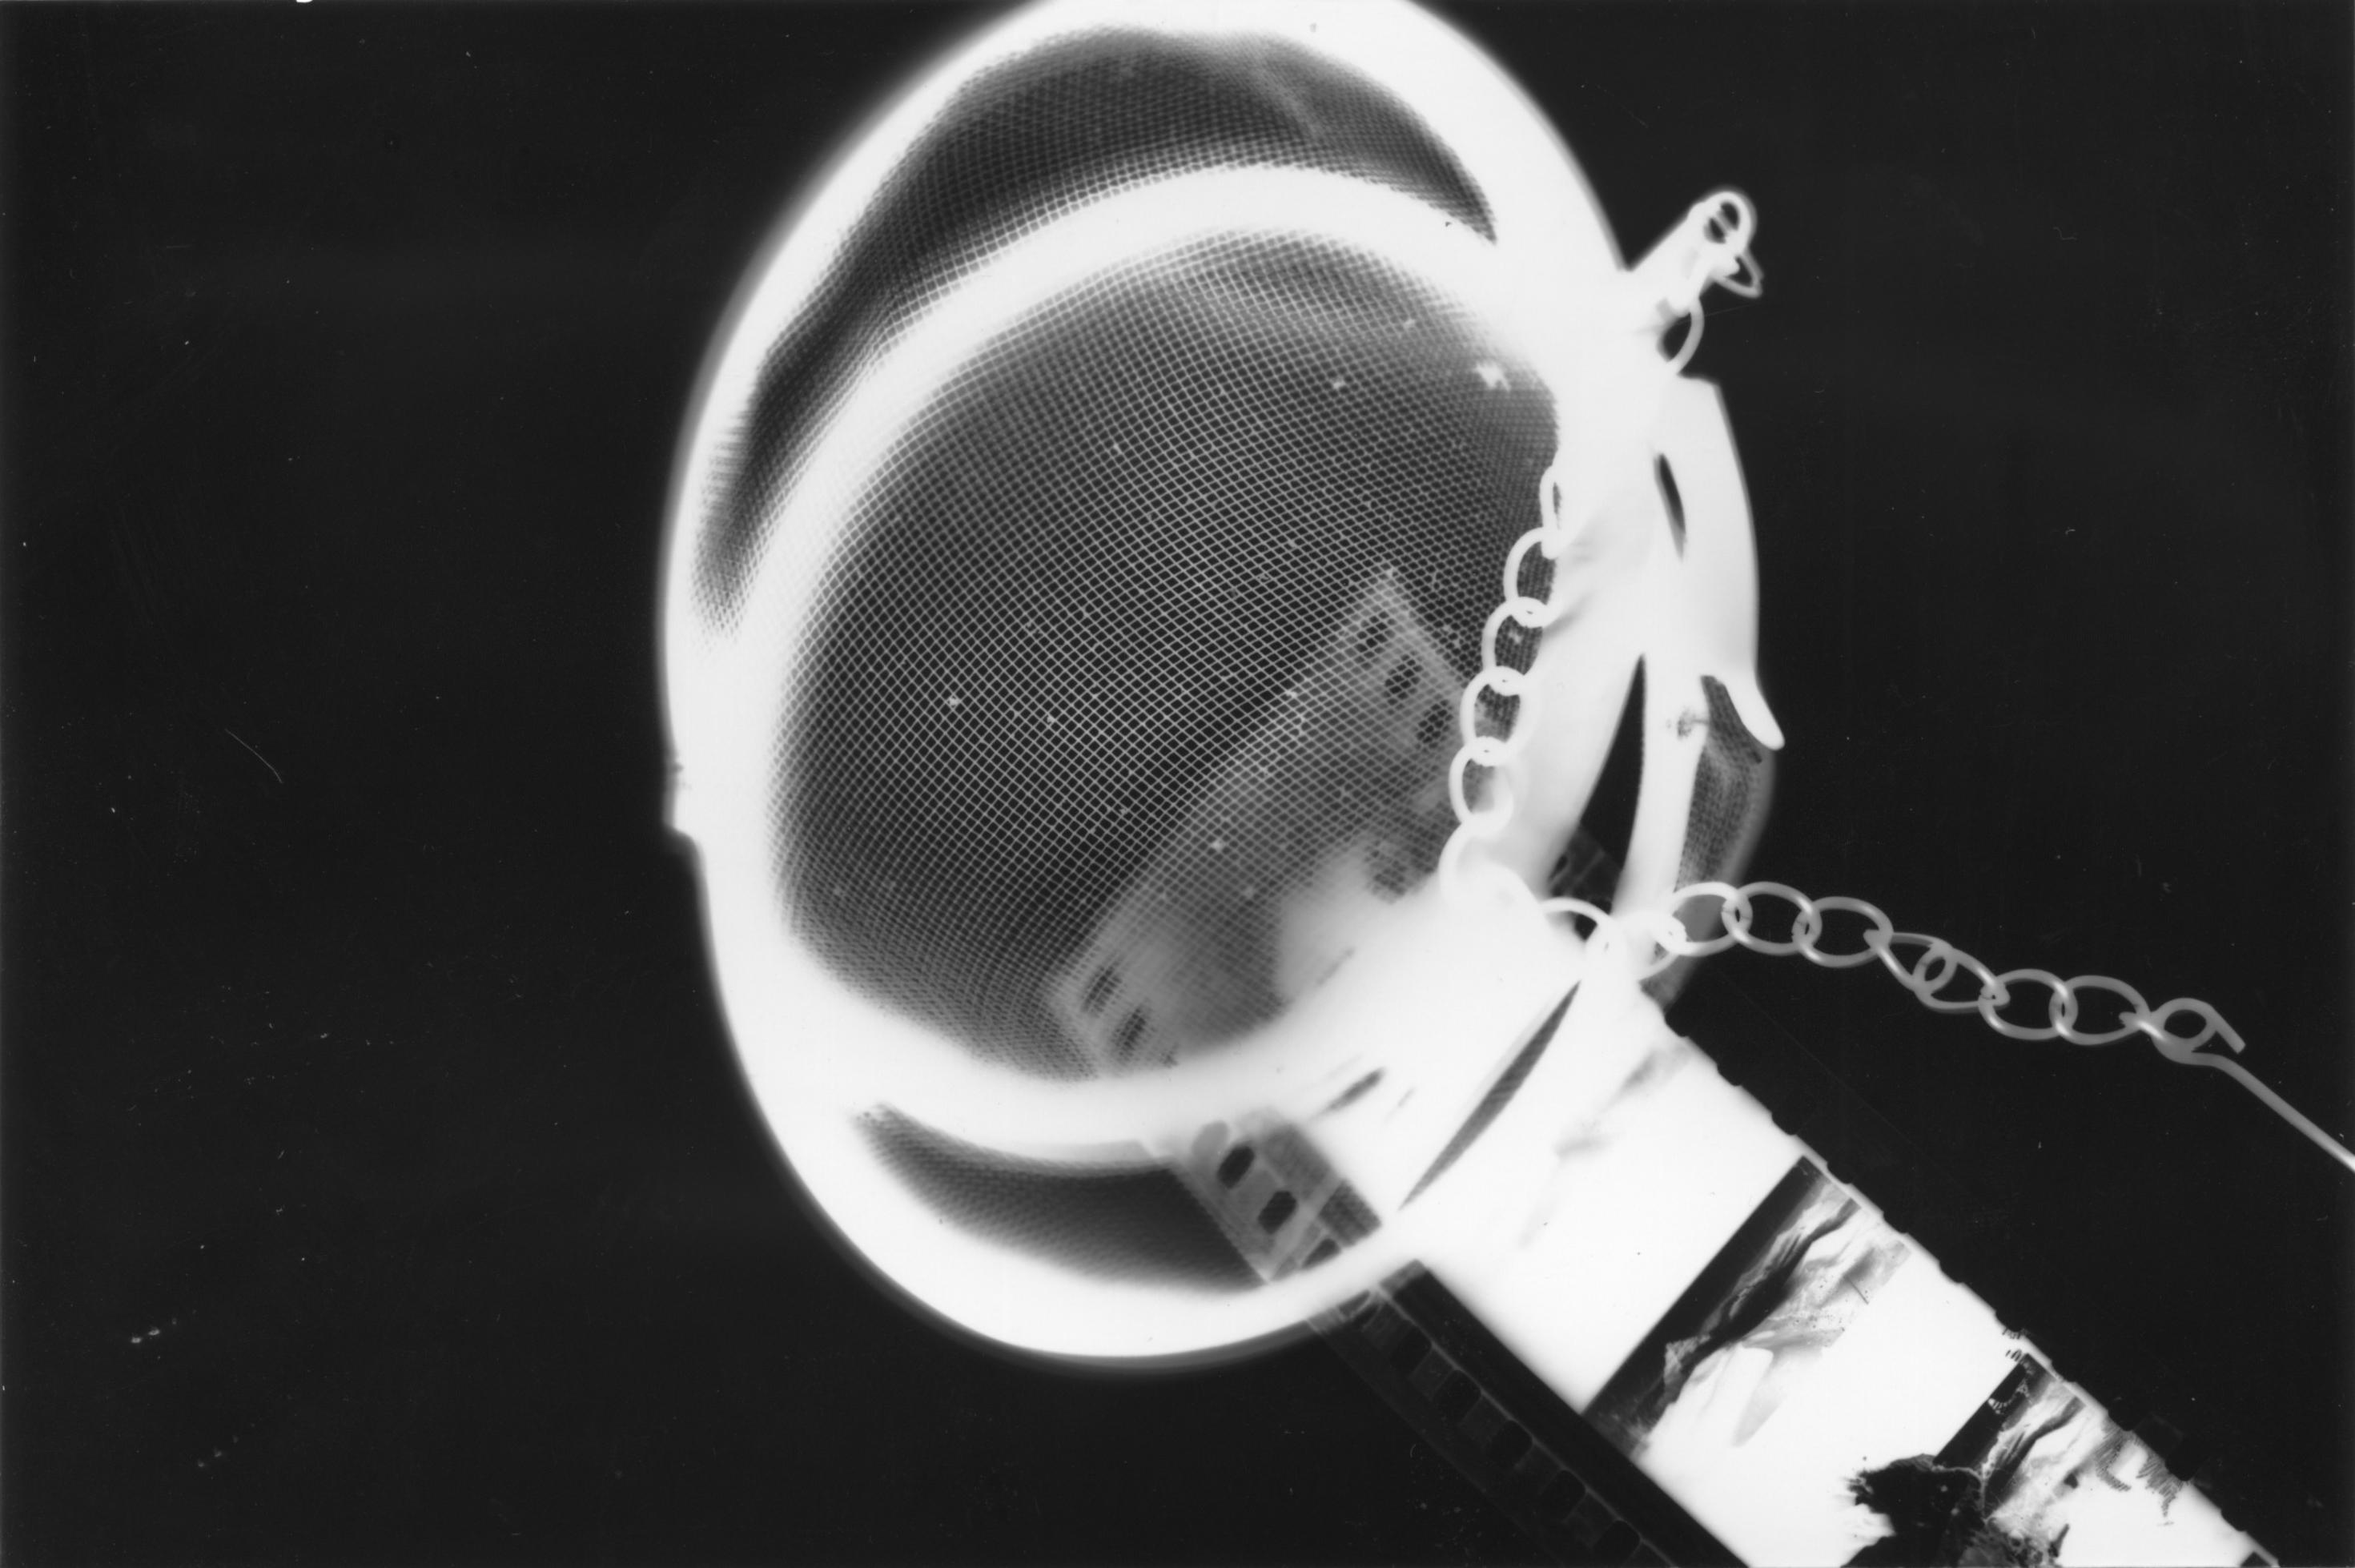 Ateliers rayogrammes pour Prisme